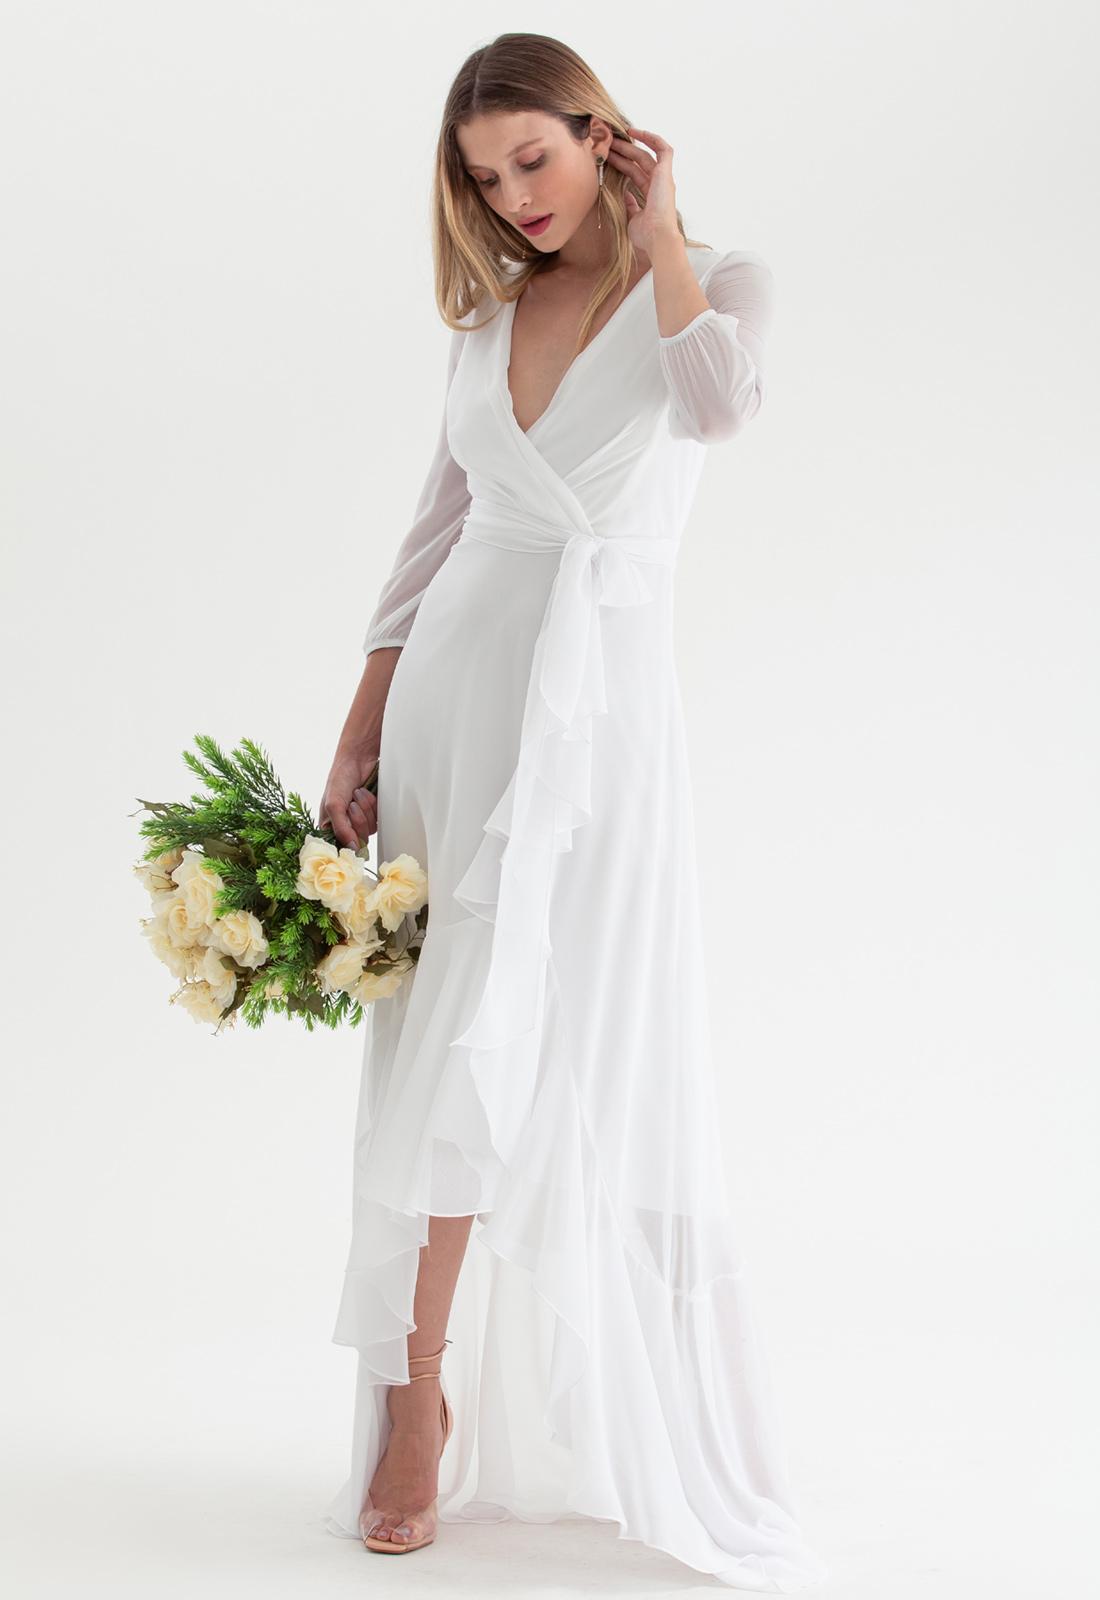 Vestido de noiva mullet Branco - Ref. 2543